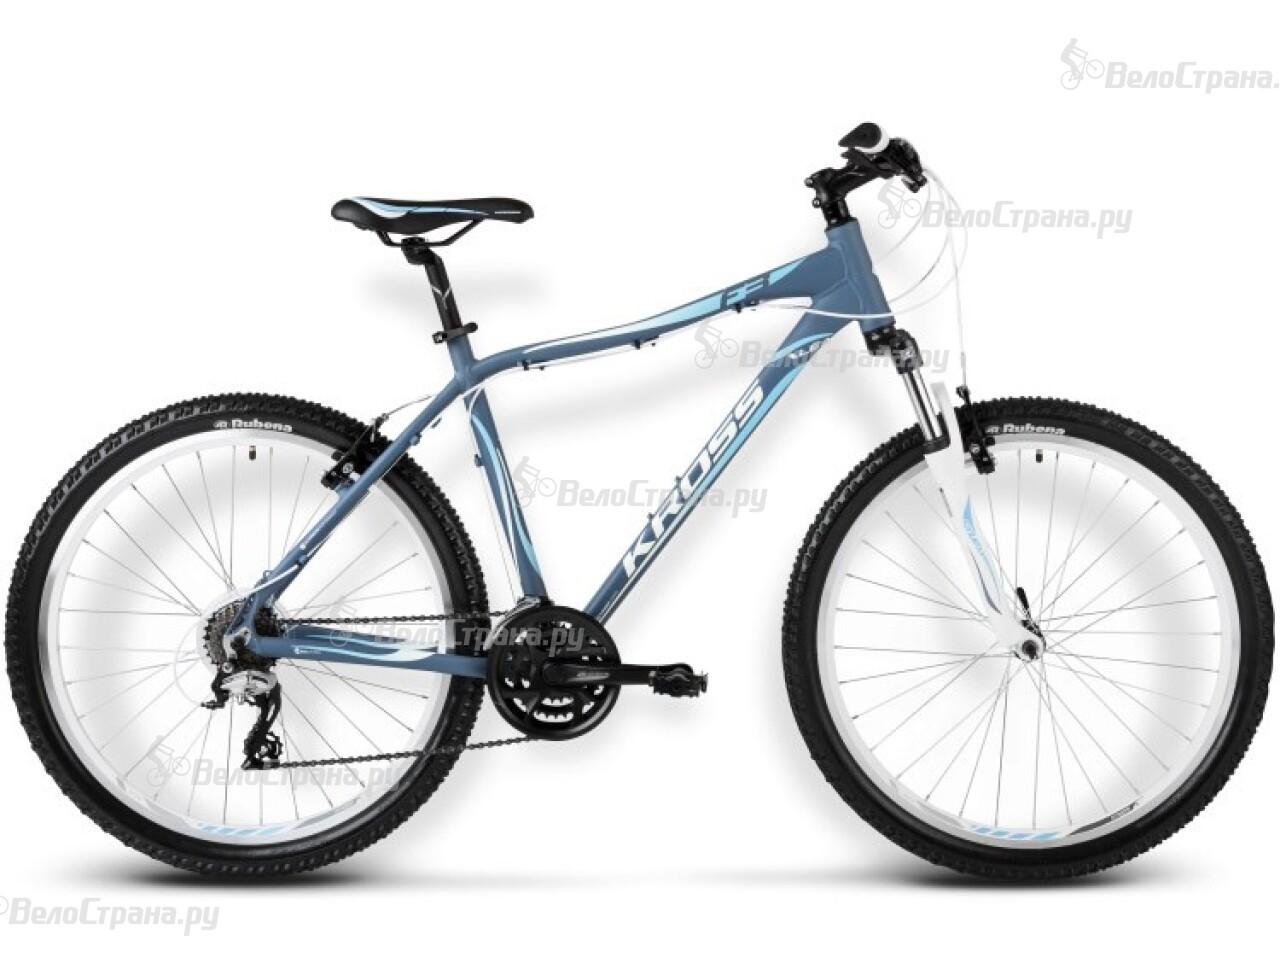 Велосипед Kross Lea F3 (2015) велосипед kross lea f4 2017